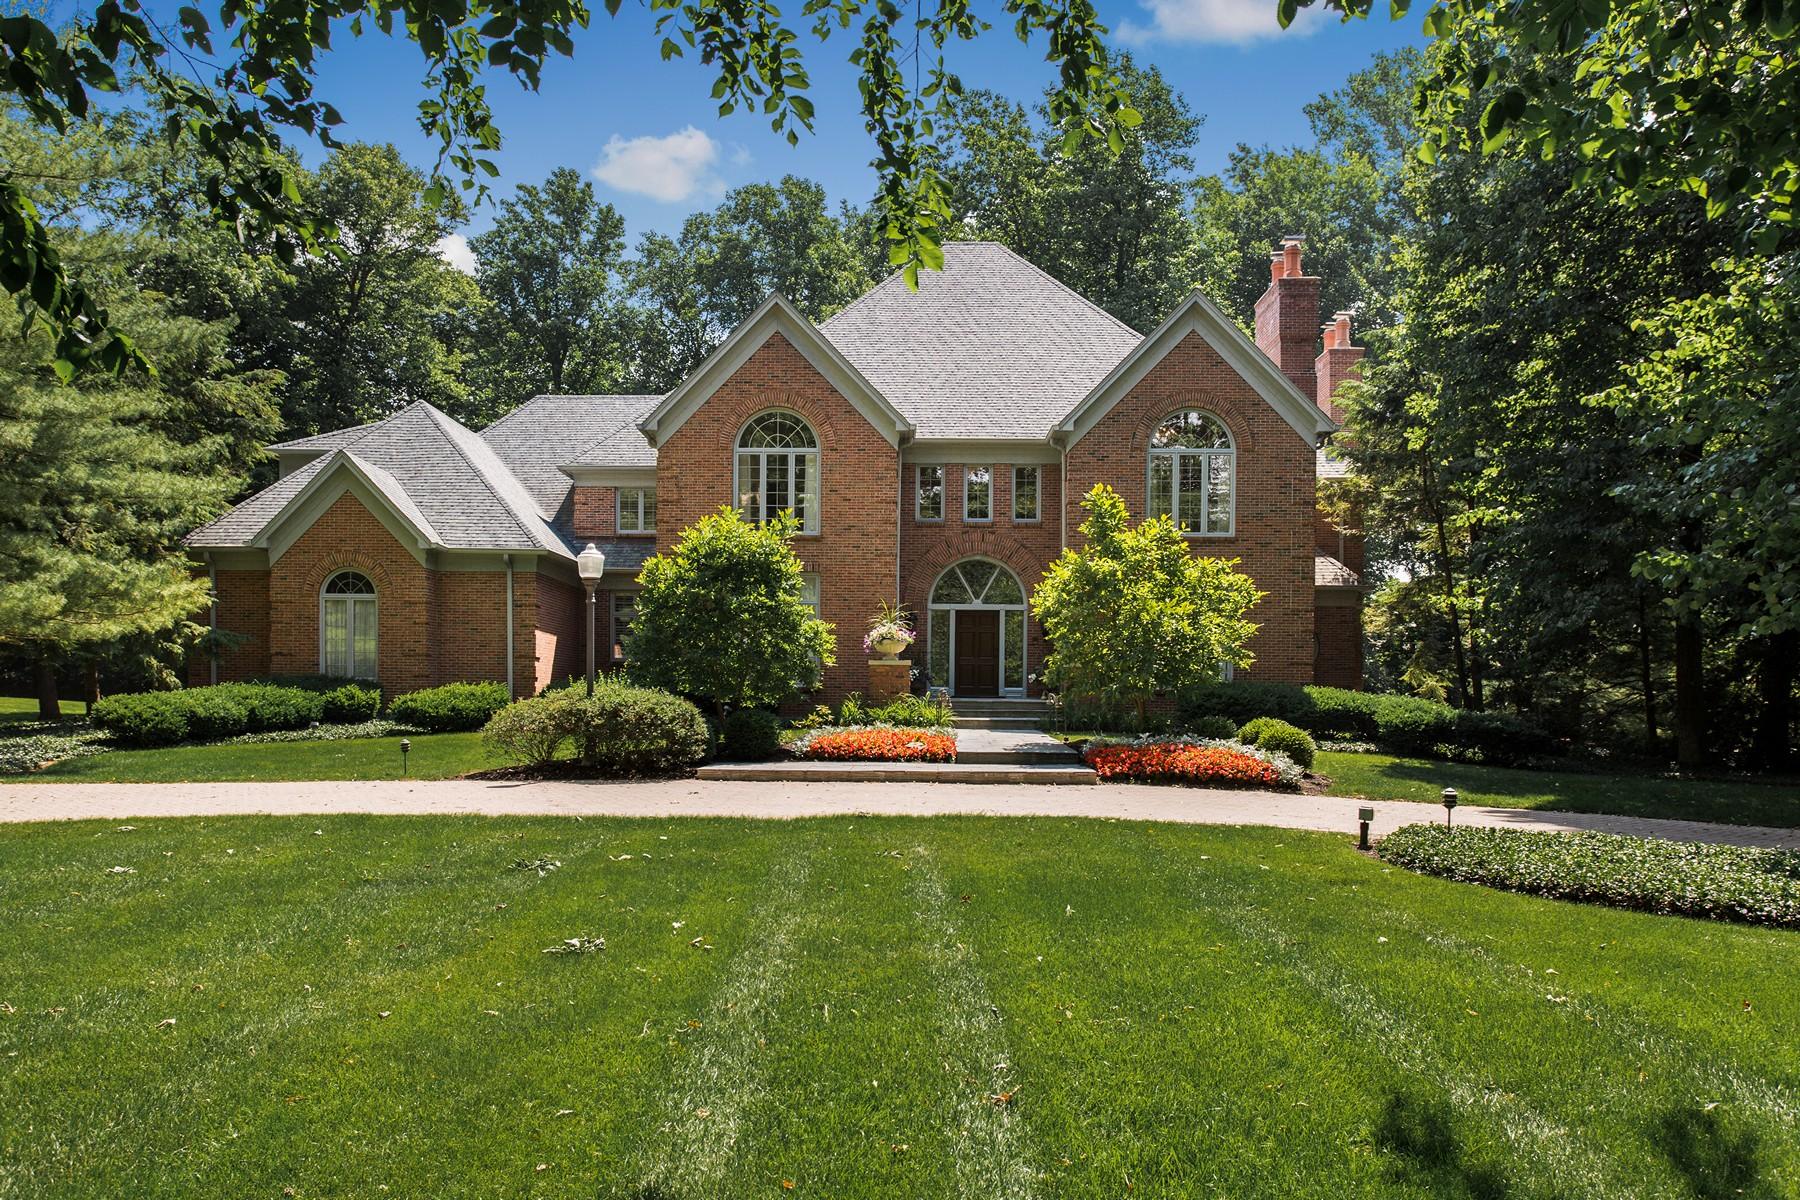 独户住宅 为 销售 在 Bridlebourne Wooded Lot 10923 Sedgemoor Circle 卡梅尔, 印第安纳州, 46032 美国